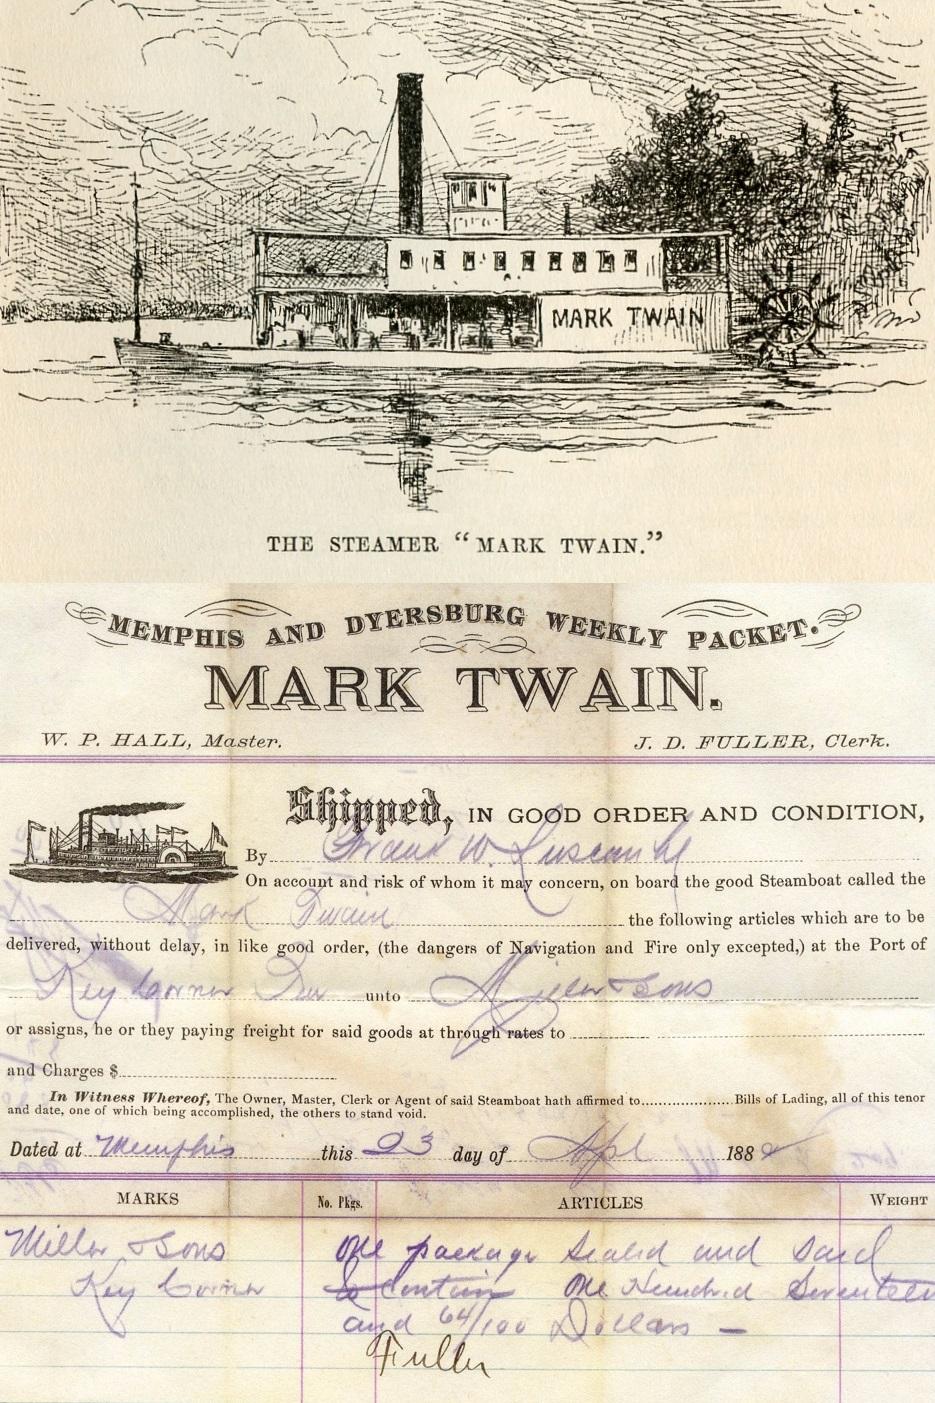 Mark Twain Guest House, Natchez